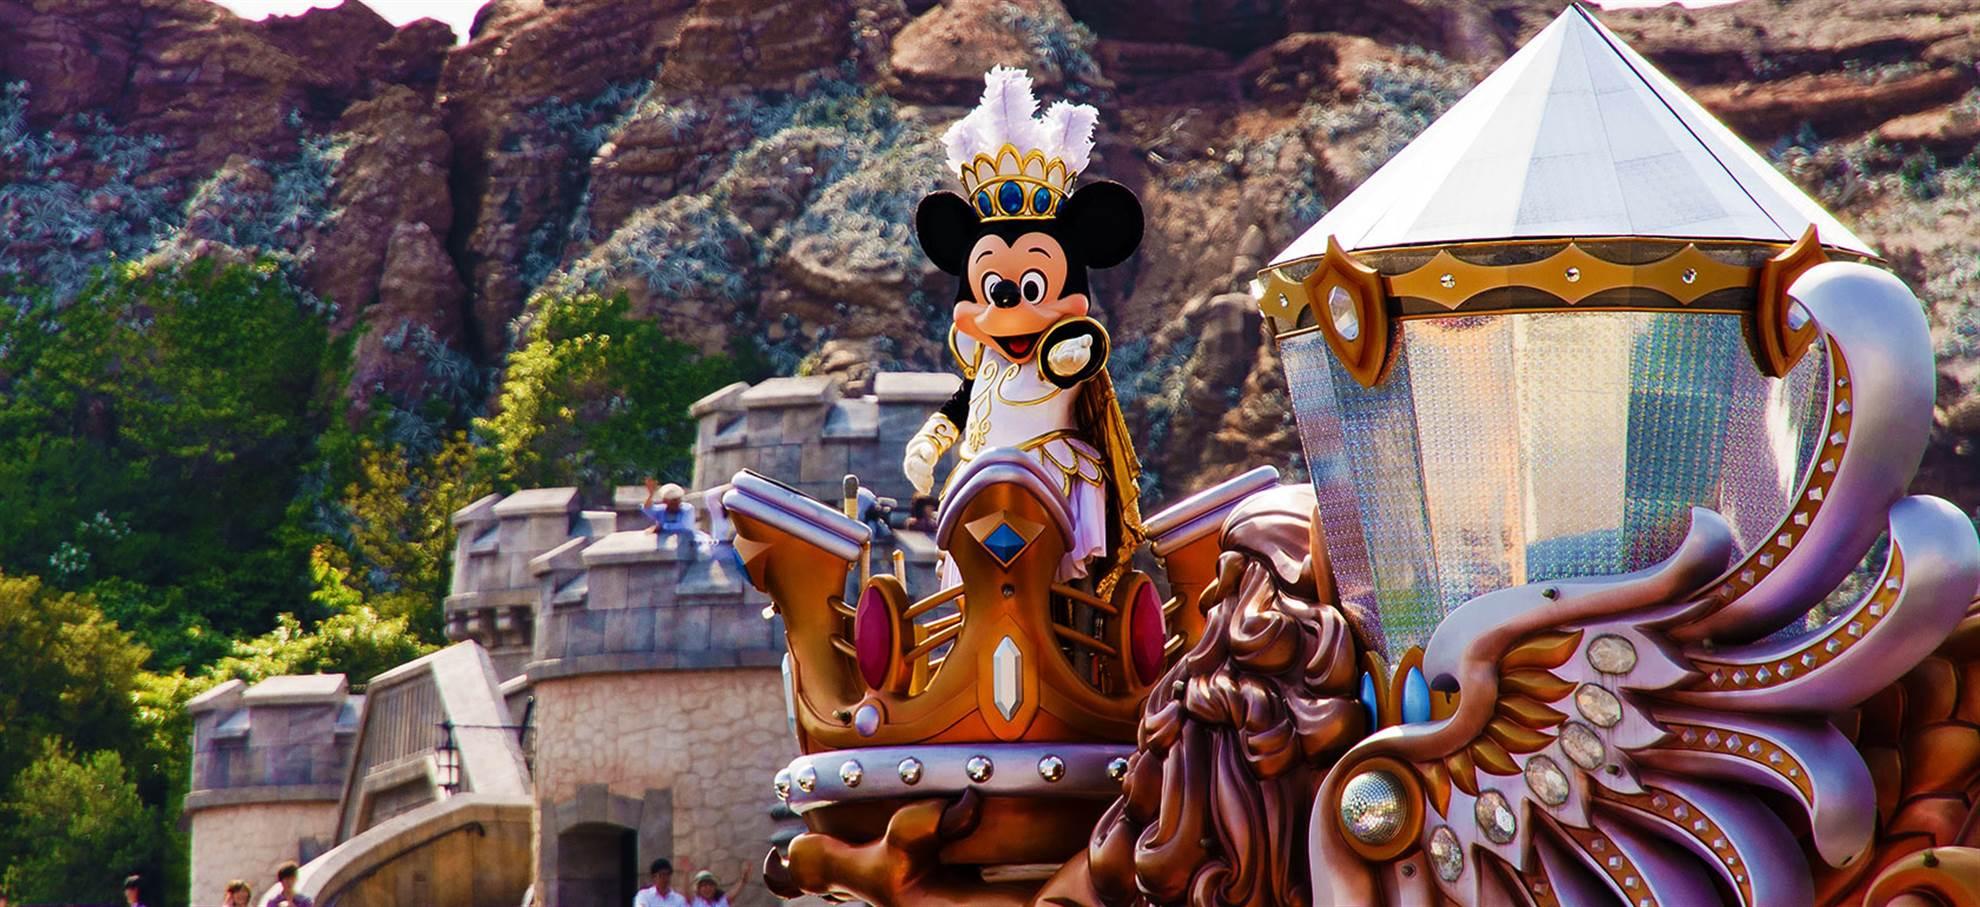 Disneyland® Paris - 1 Tag - 2 Parks